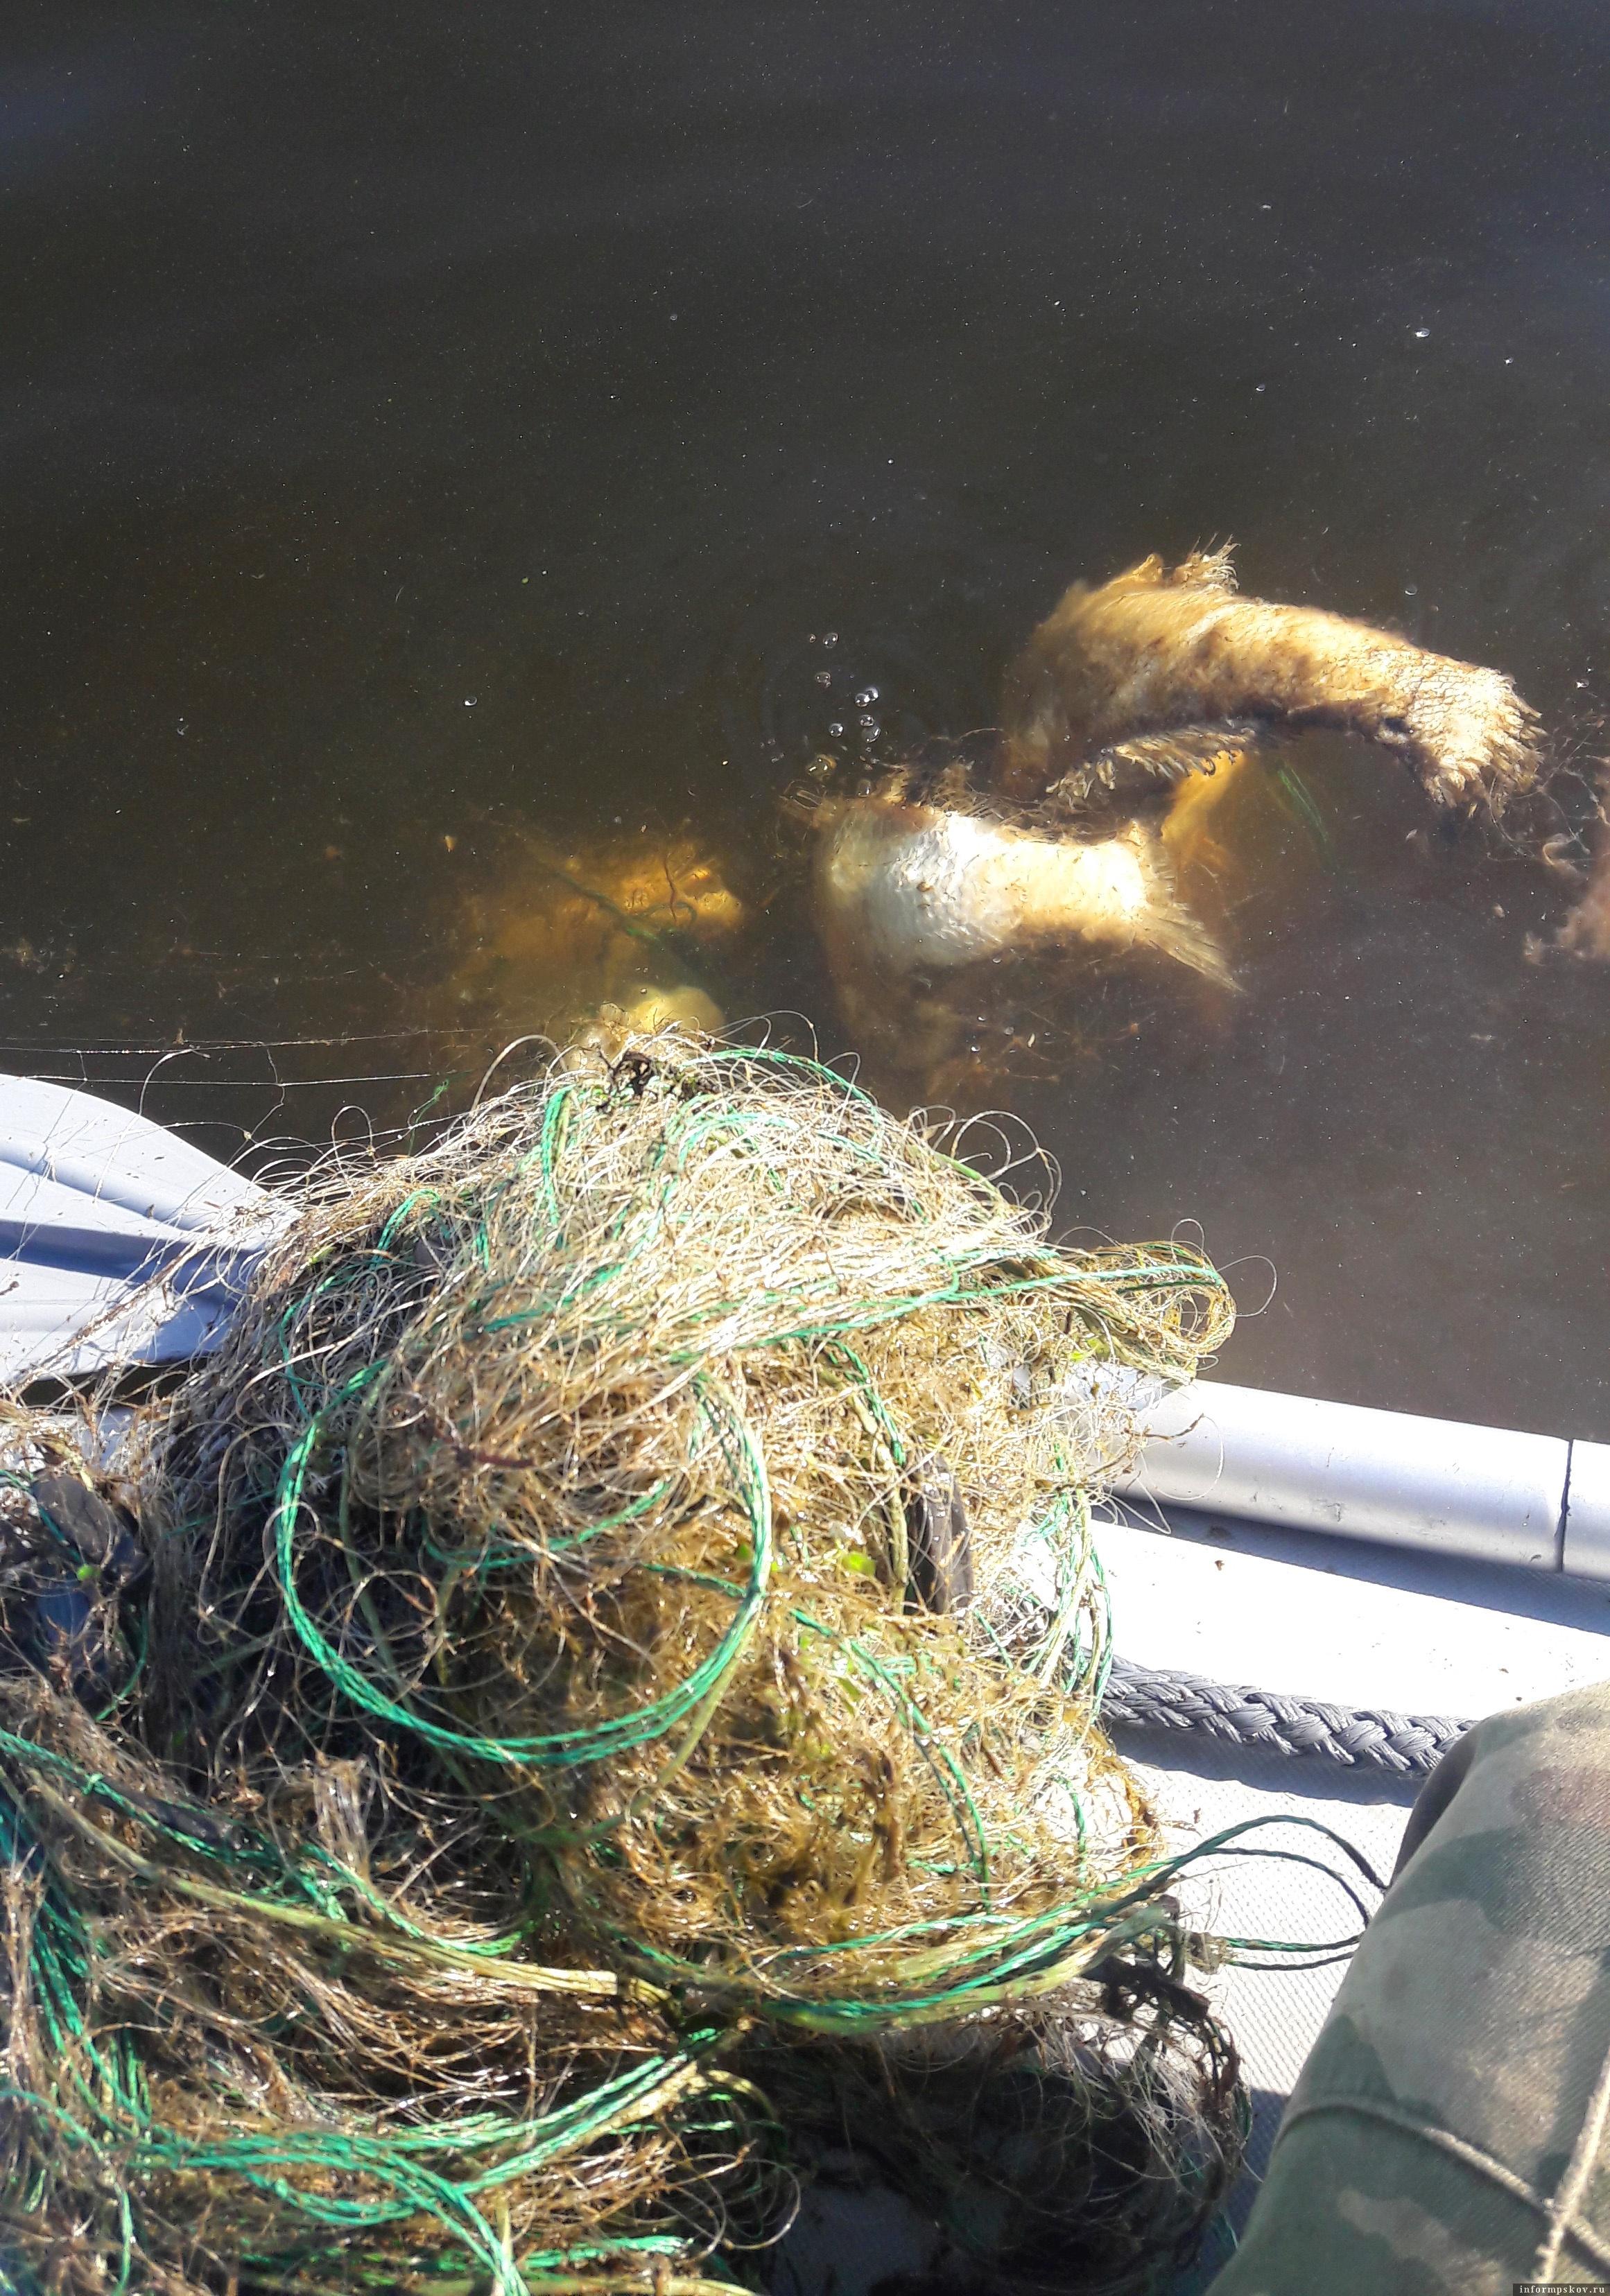 Гниющая в сетях рыба.Фото автора.